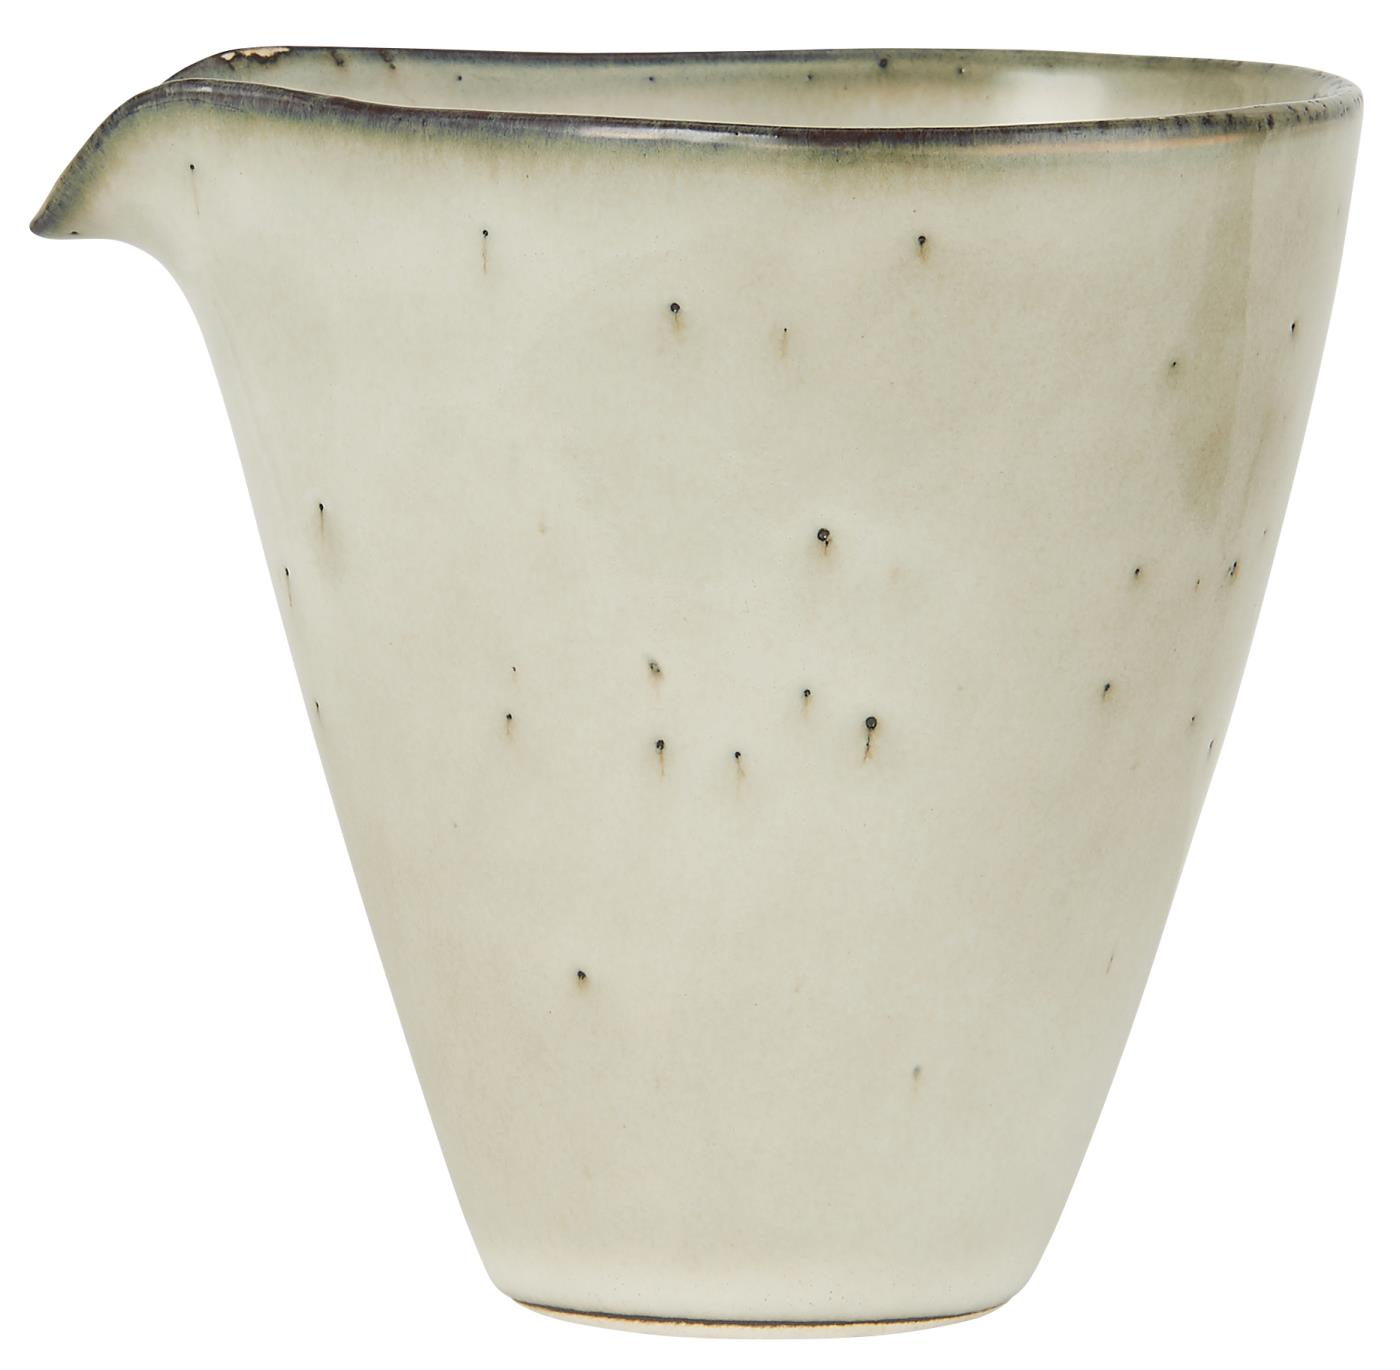 Milchkanne sand - ib Laursen